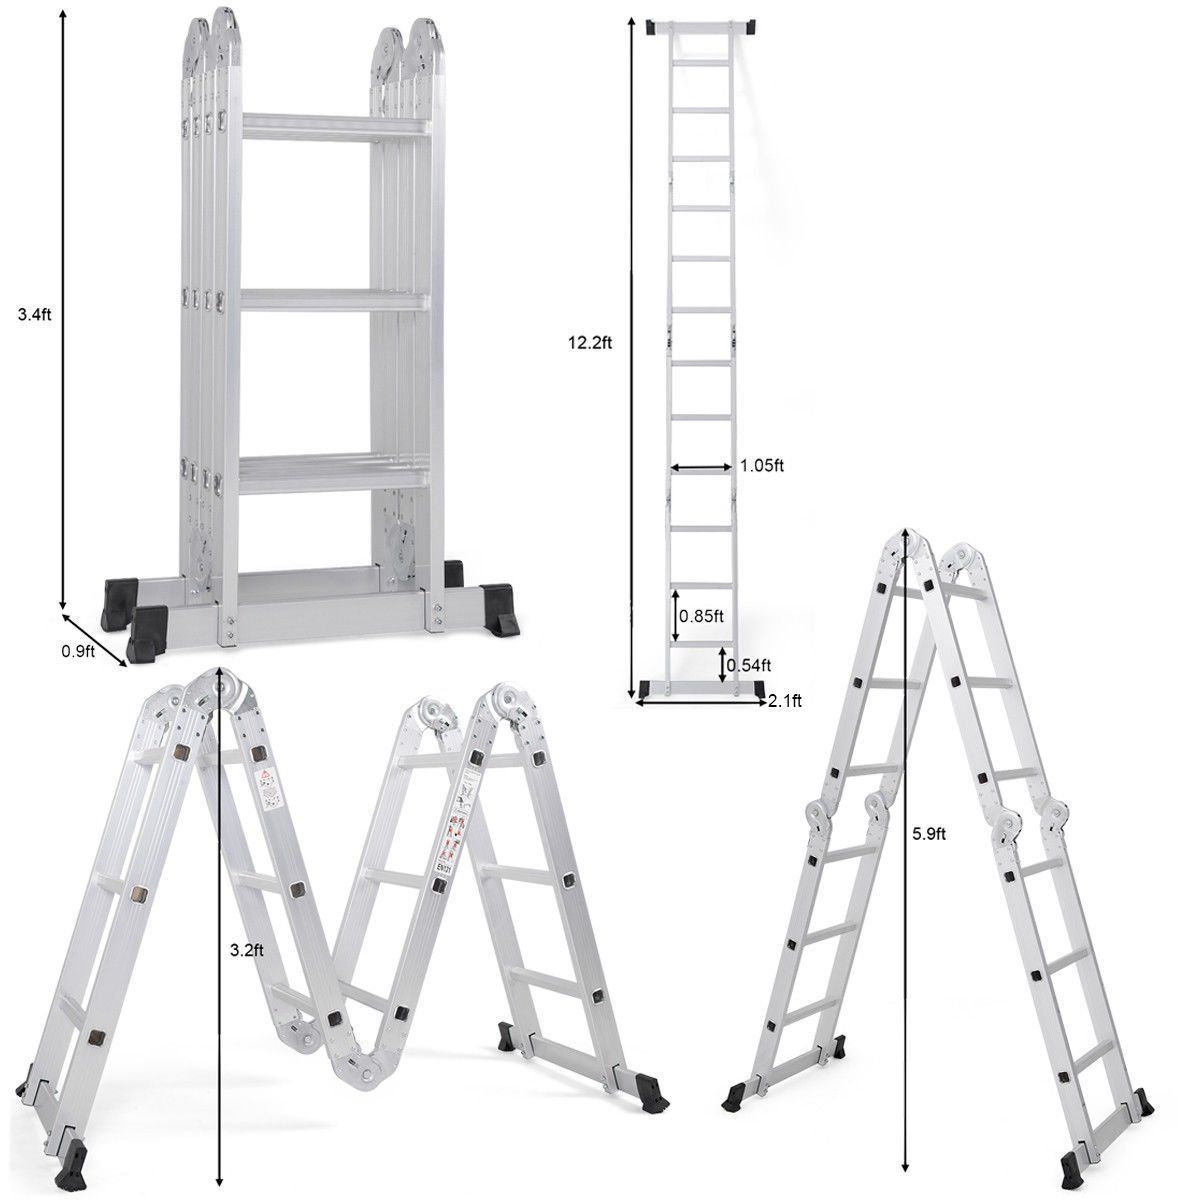 12 5ft En131 330lb Multi Purpose Step Platform Aluminum Folding Scaffold Ladder See The Picture Link Even More Details Scaffold Ladder Ladder Scaffolding